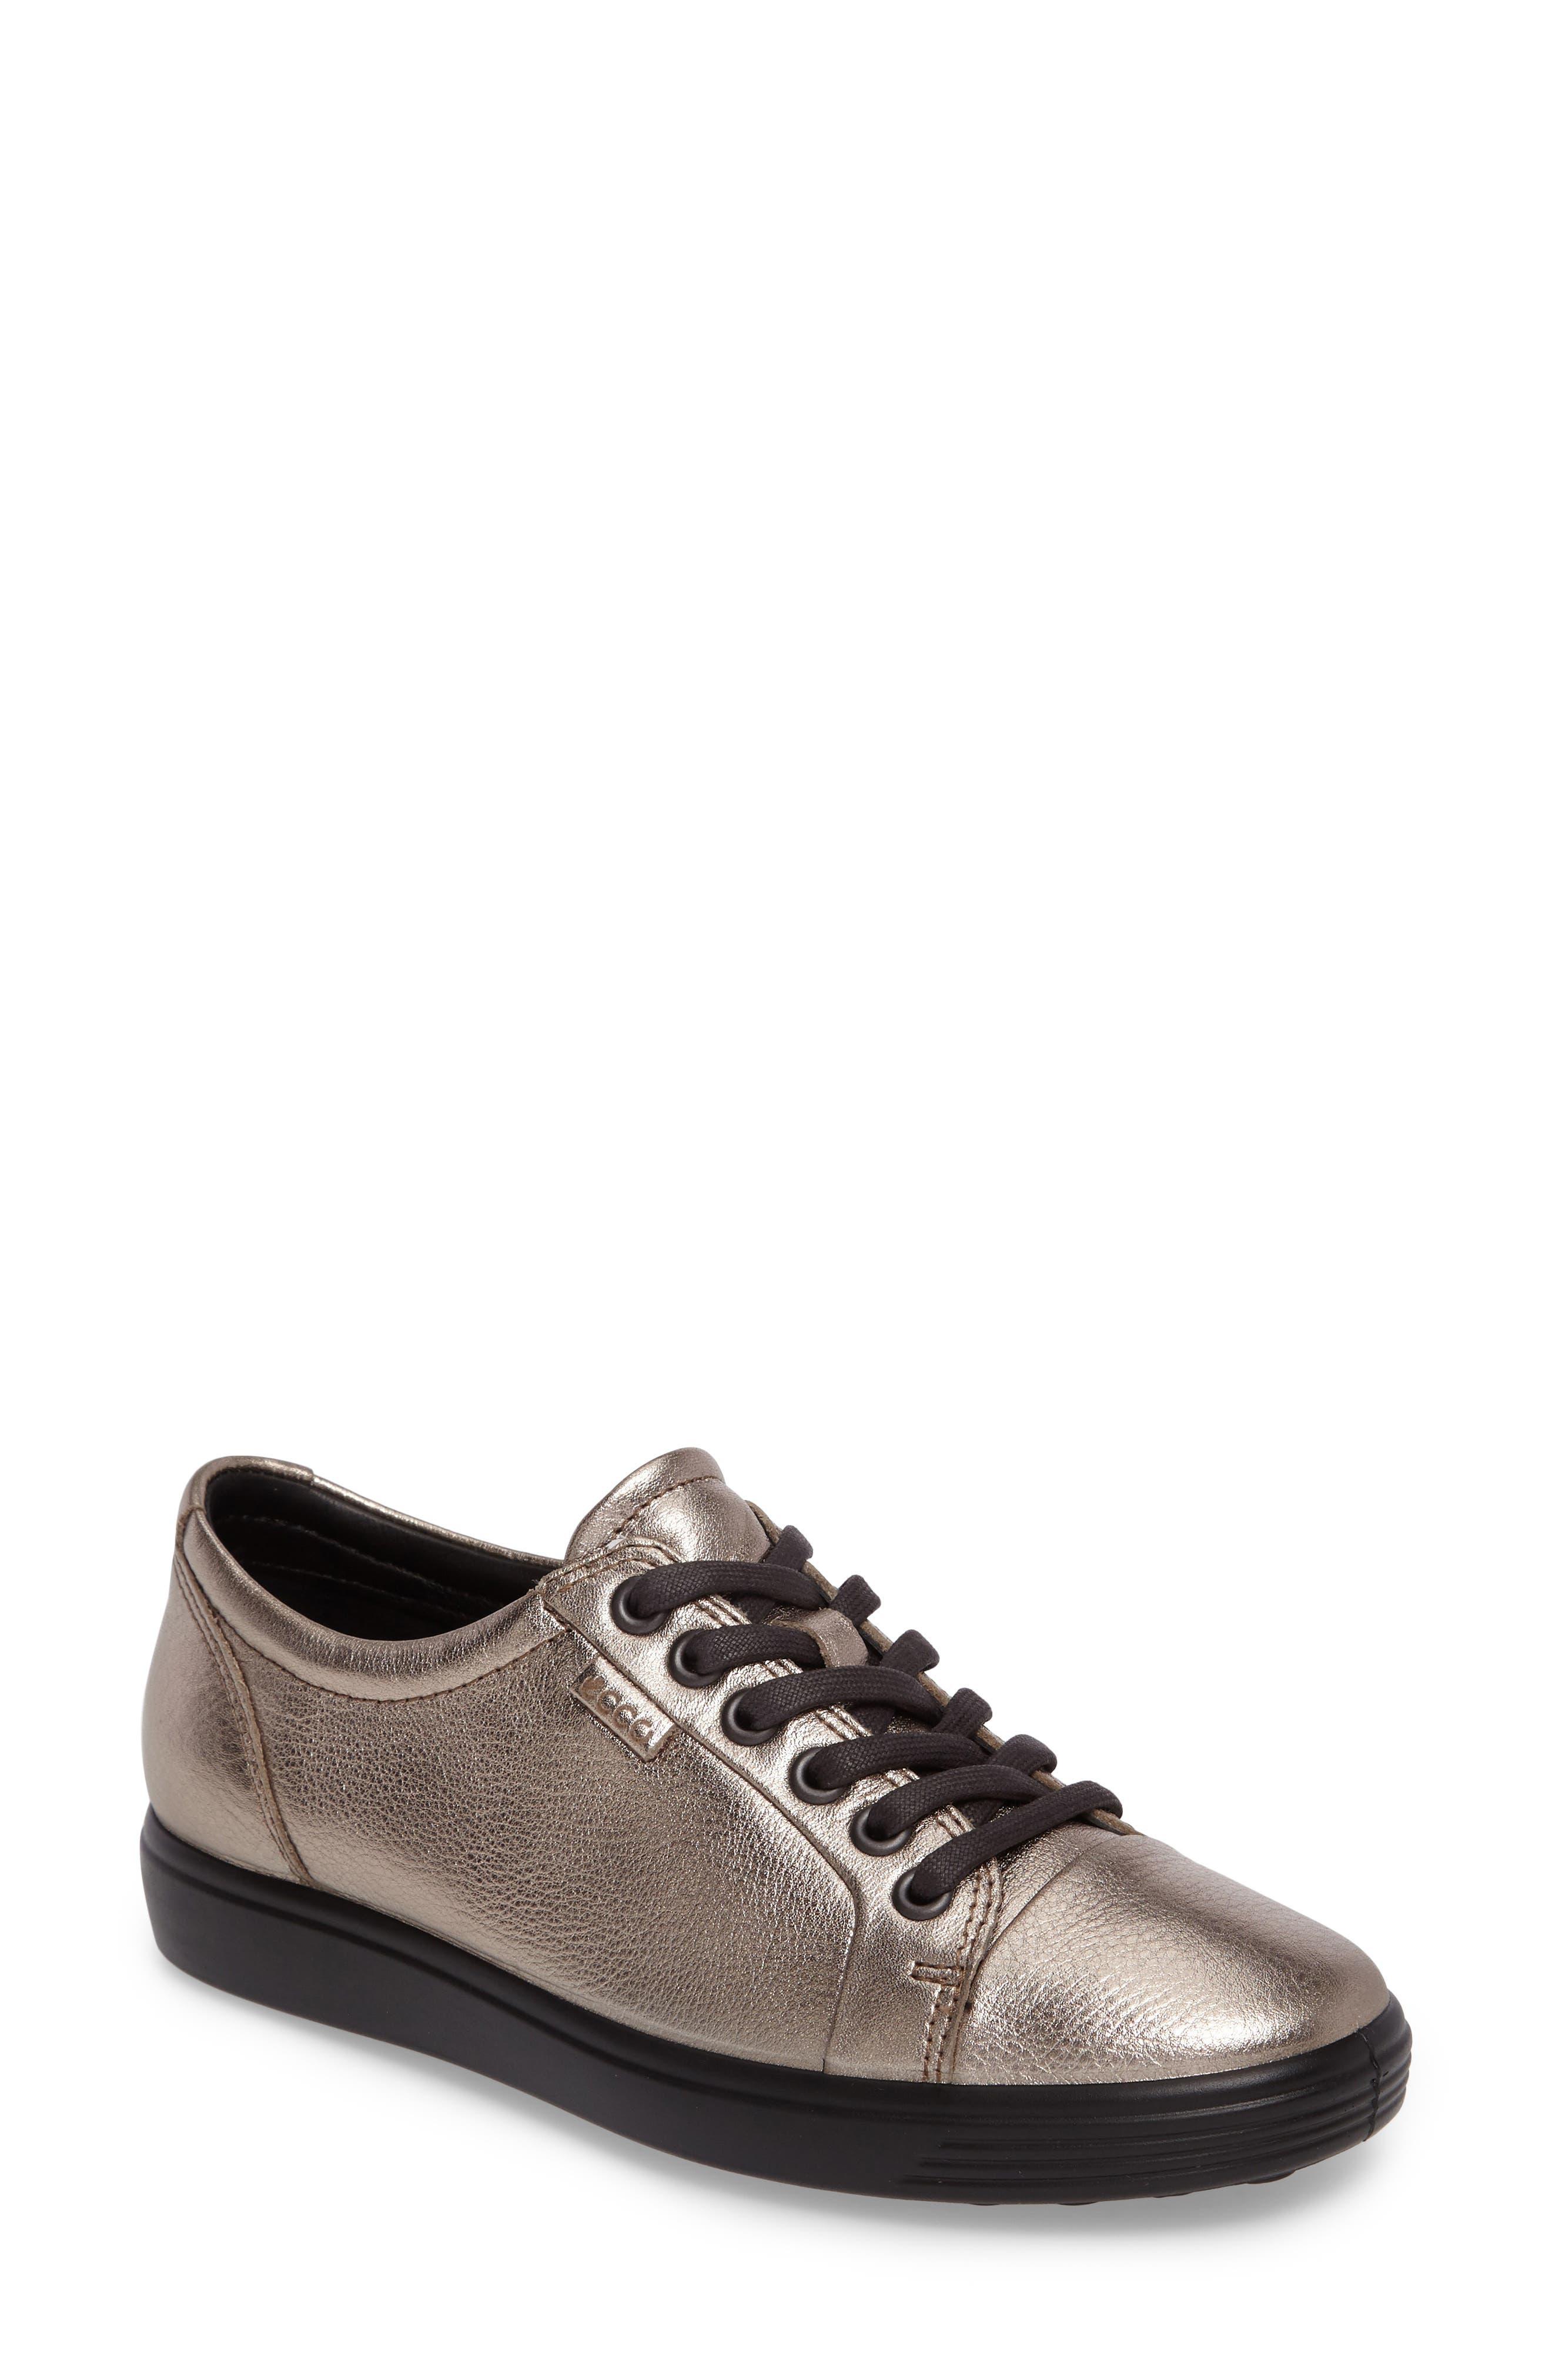 ECCO 'Soft 7' Cap Toe Sneaker